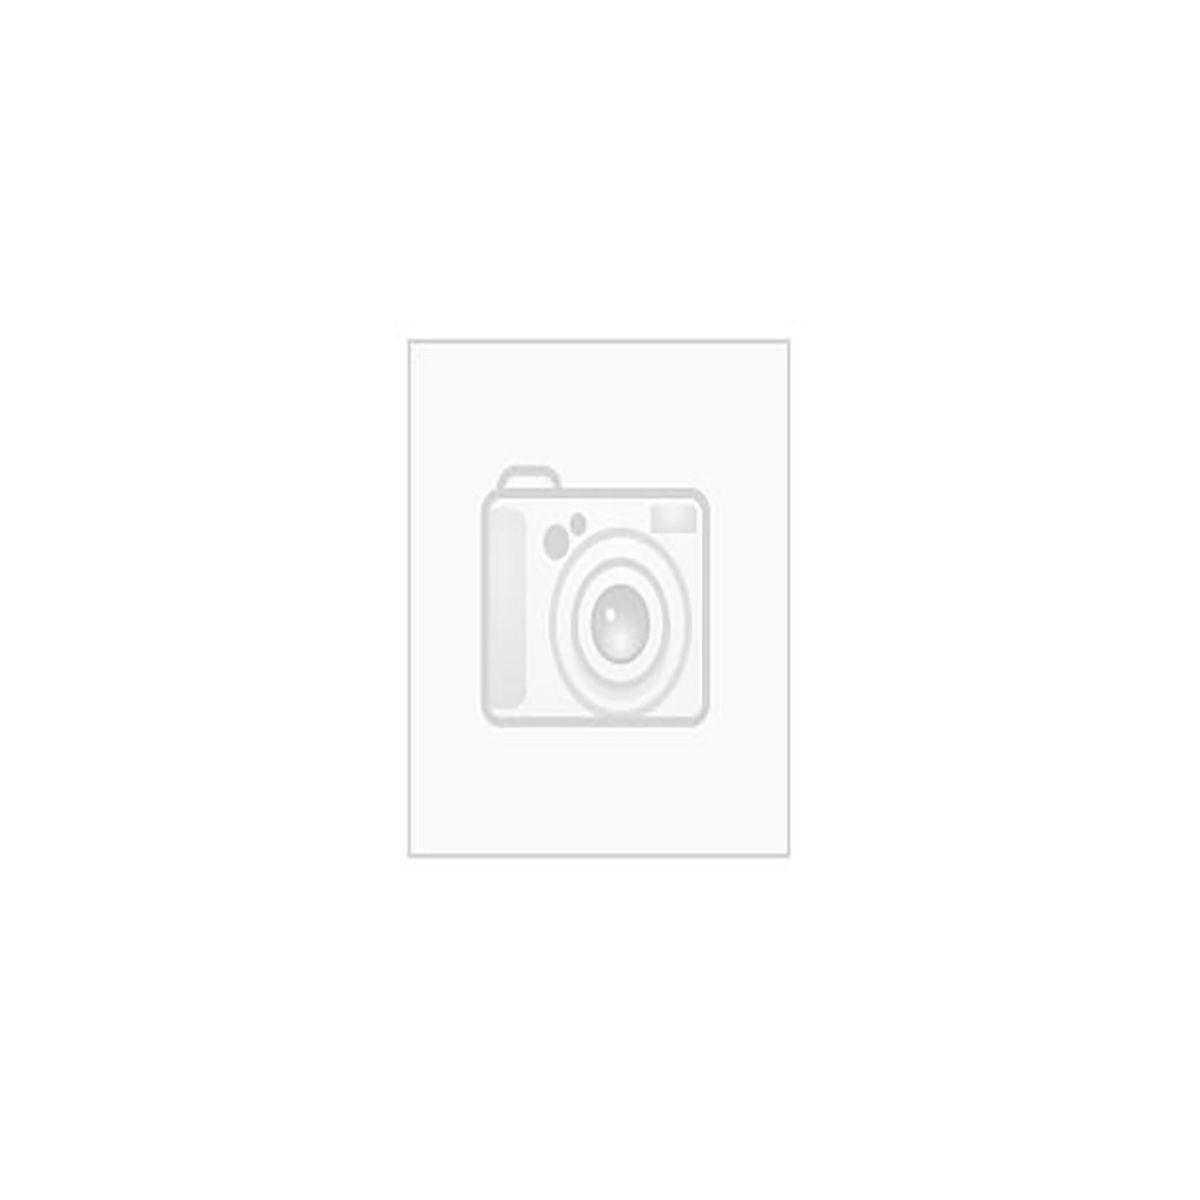 Tippunion Sanipex Calor, forkrommet  3/8 x 12 mm Tippunion Sanipex